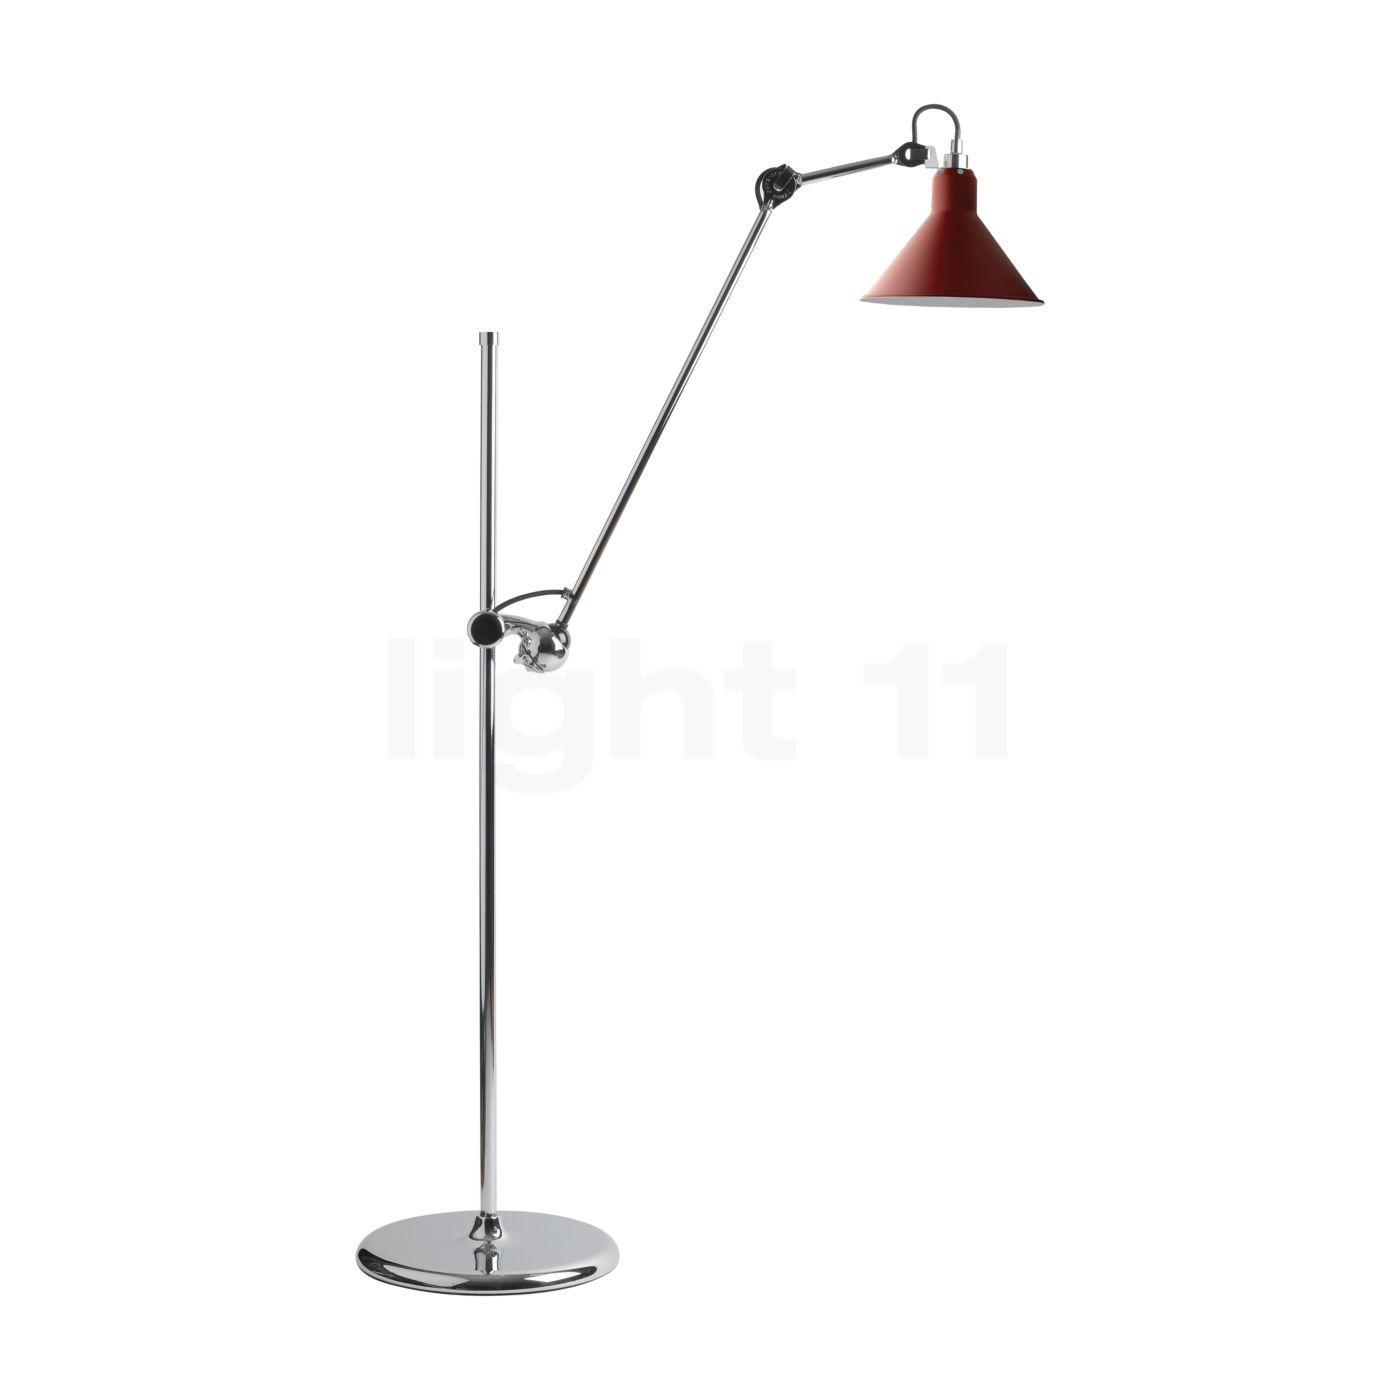 Lampen 39594 angebote auf find for Lampen angebote